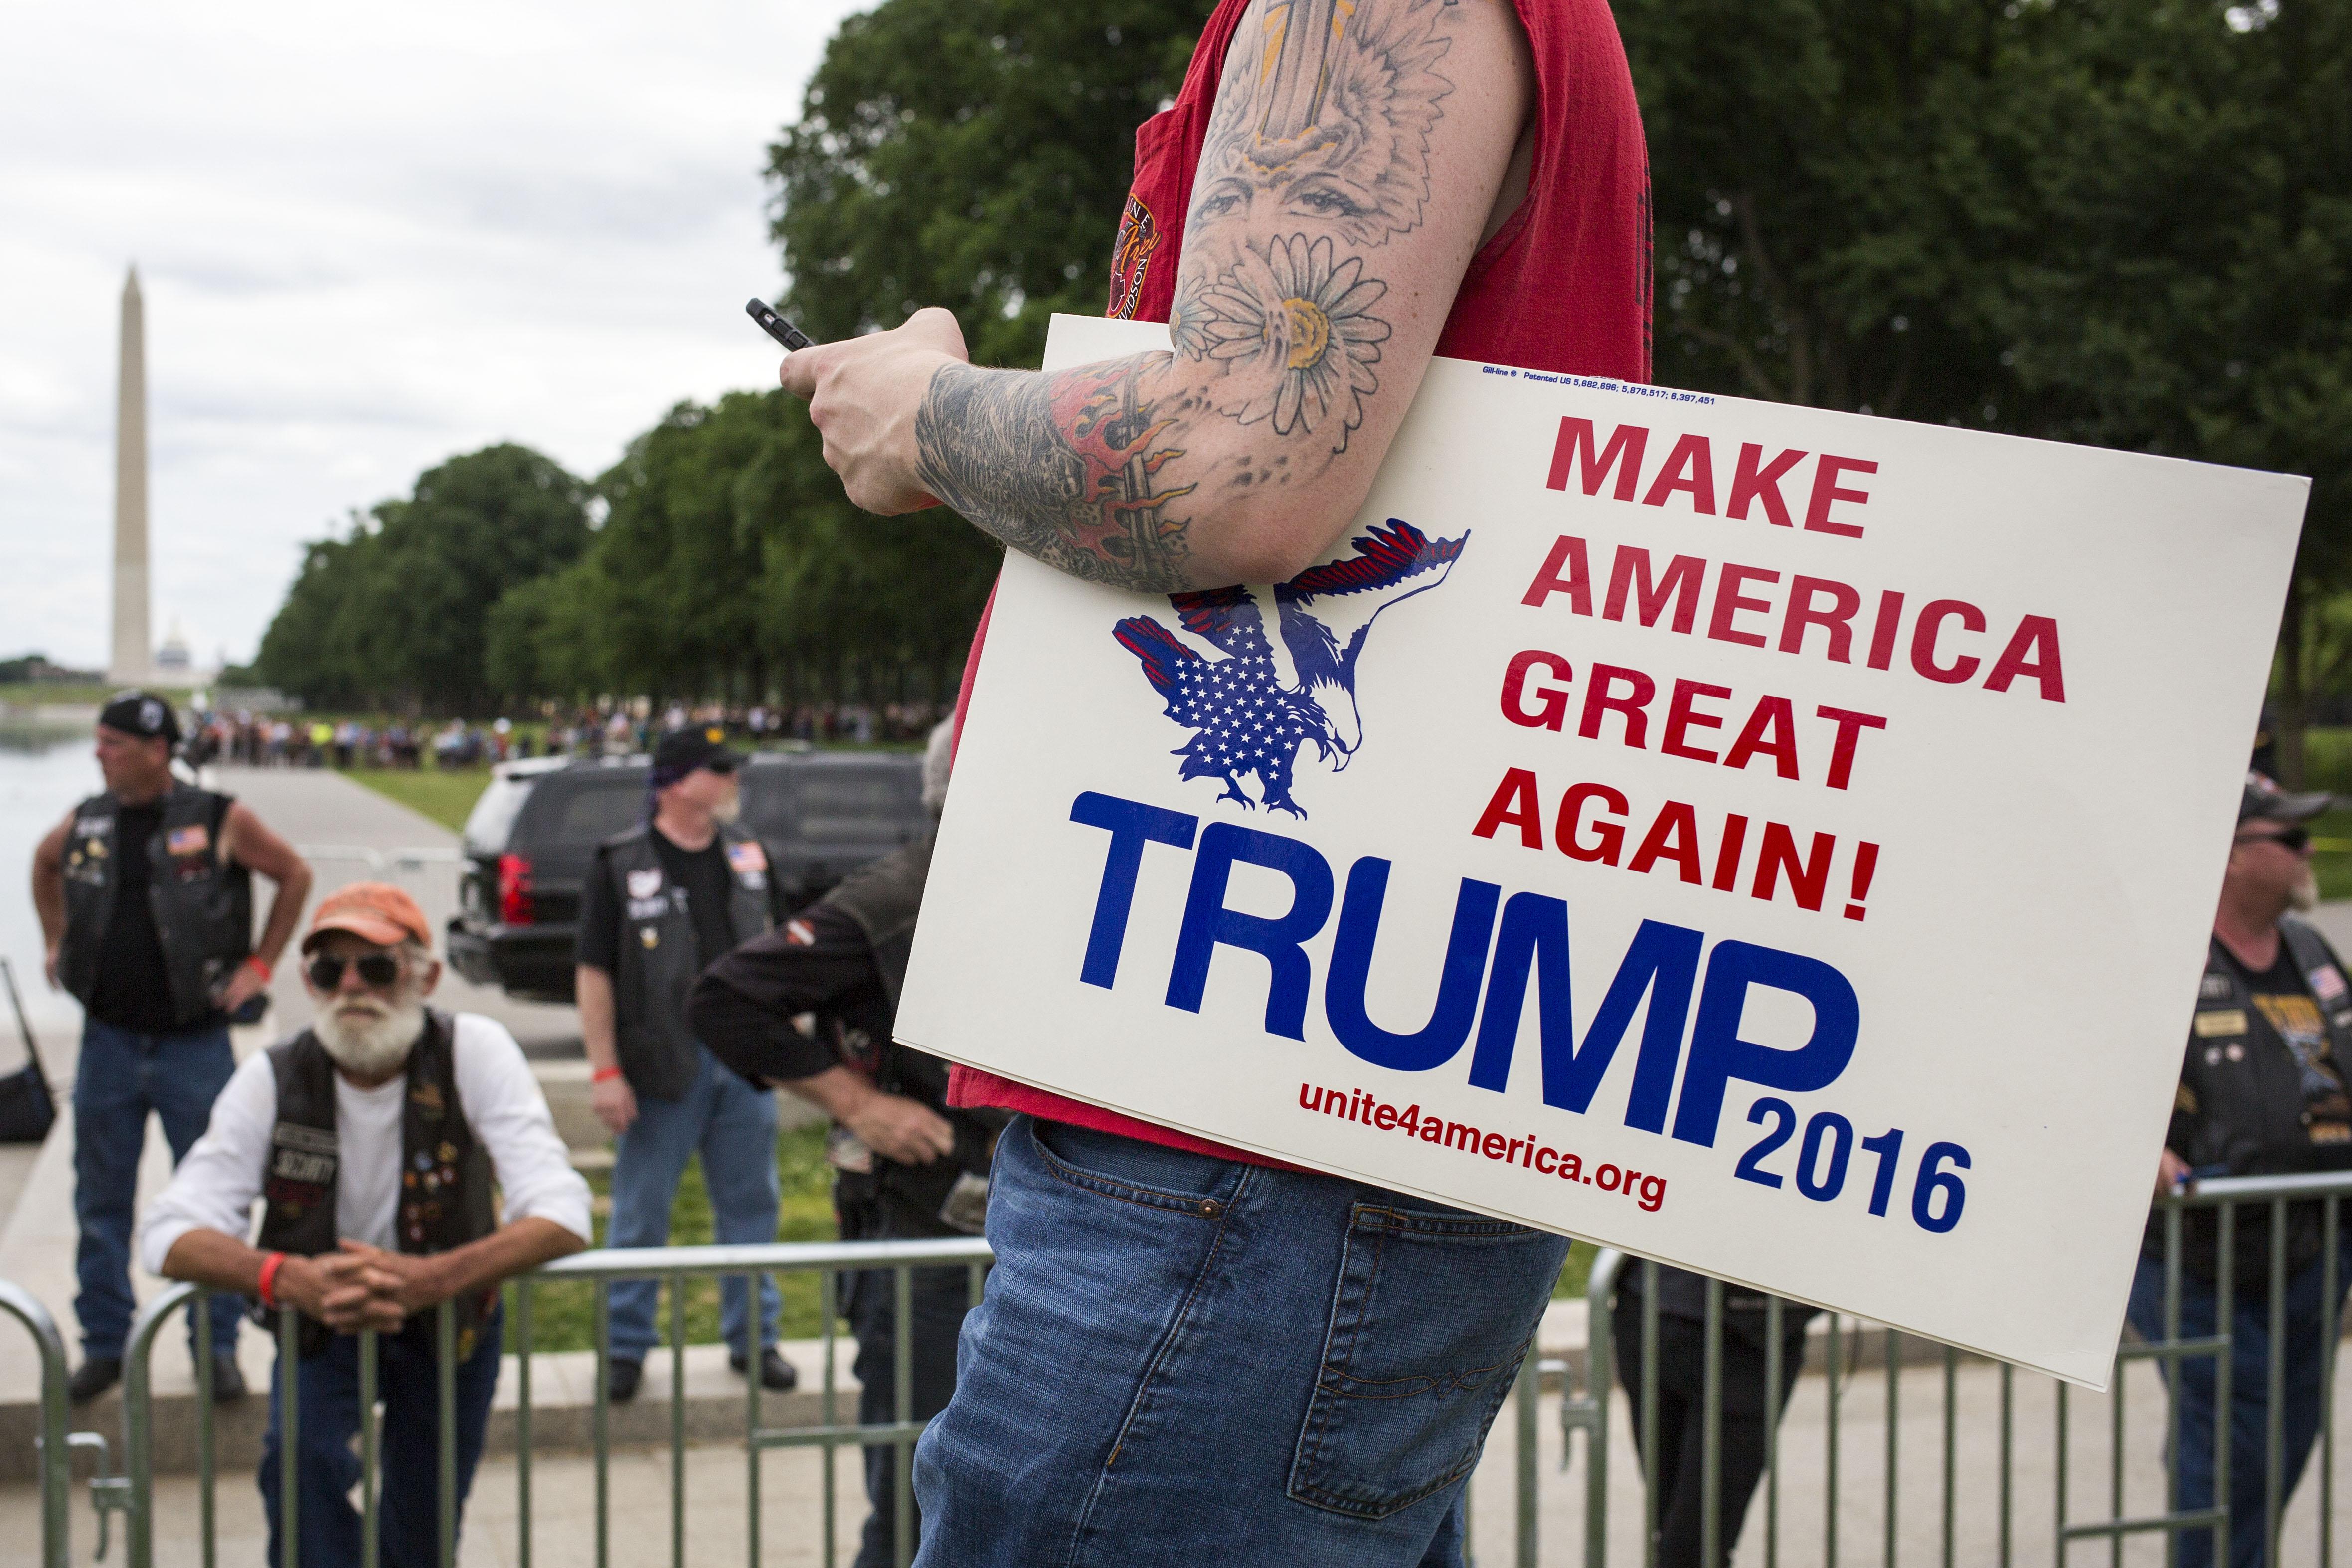 GOP Donald Trump at Rolling Thunder Bike Rally